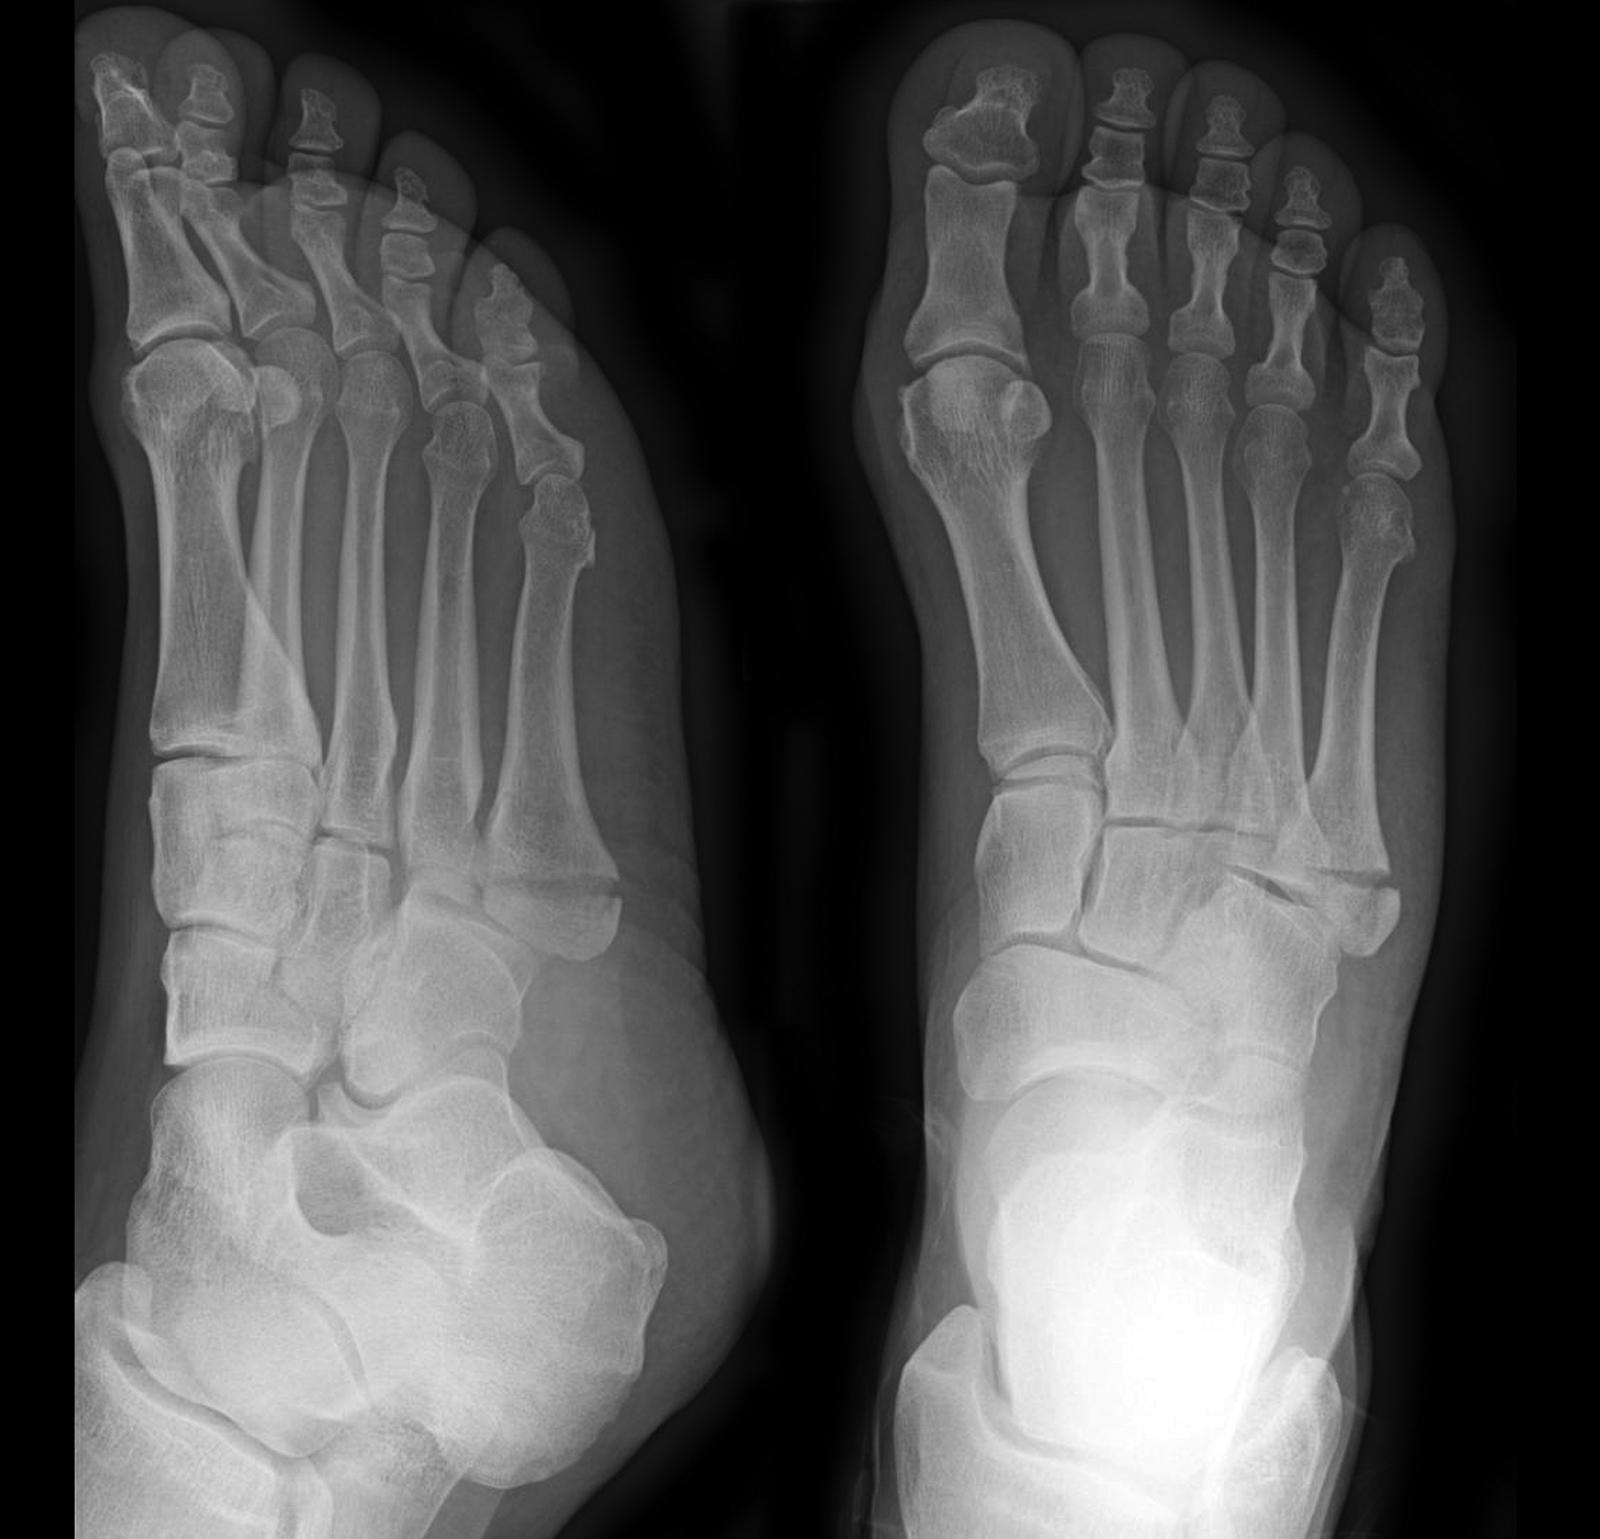 Figure 4: Zone 2 fracture